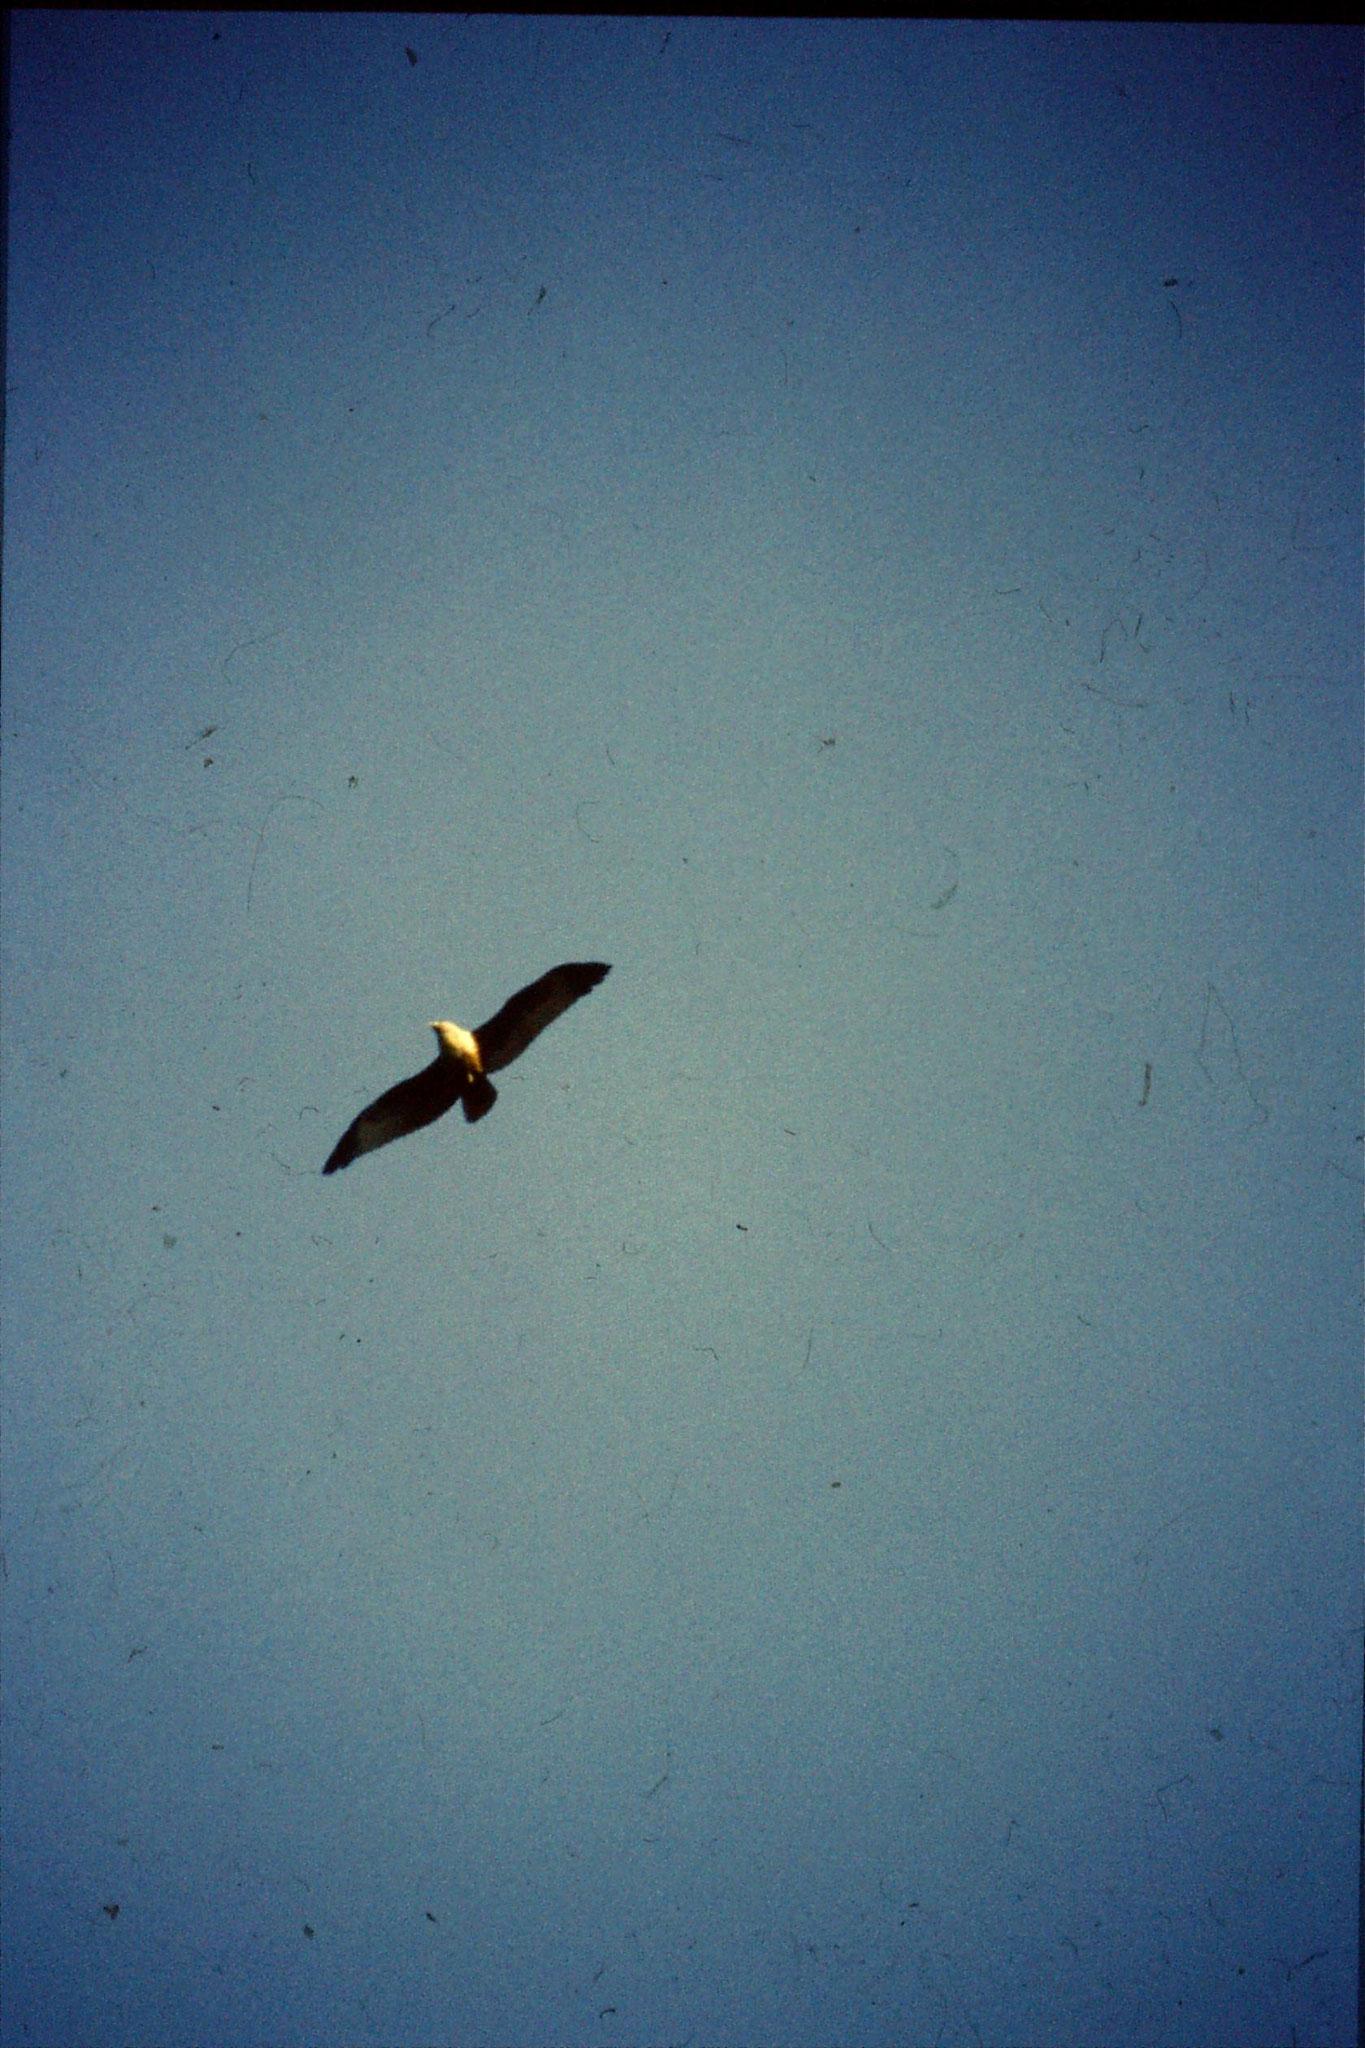 30/12/1989: 0:Goa Candolim Brahminy Kite